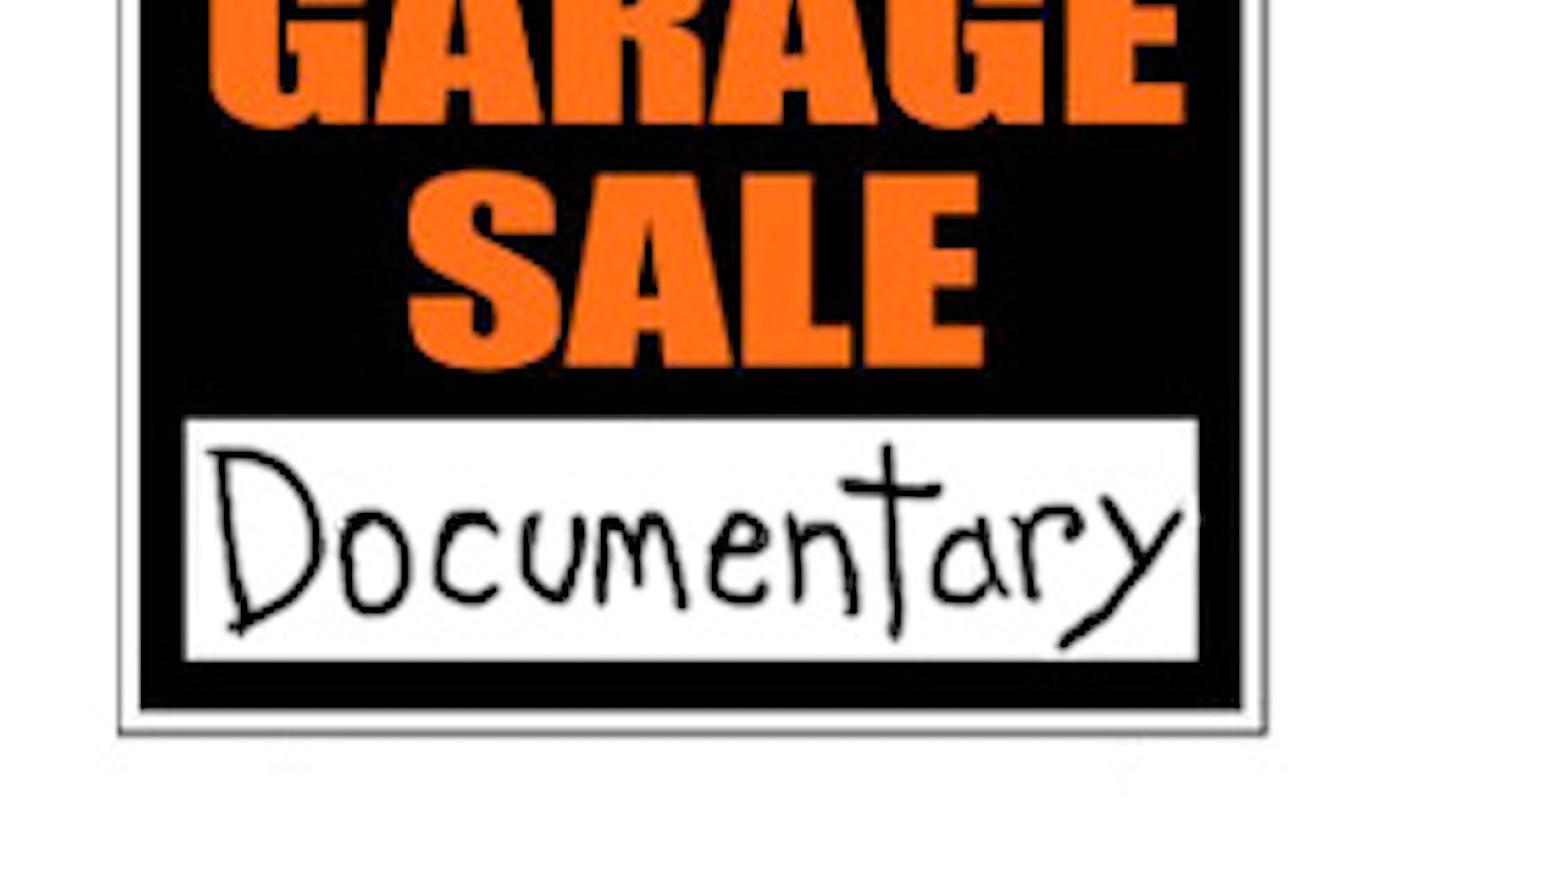 THE GARAGE SALE DOCUMENTARY - The Last Free American Market Placewatch it on www.GarageSaleDocumentary.com